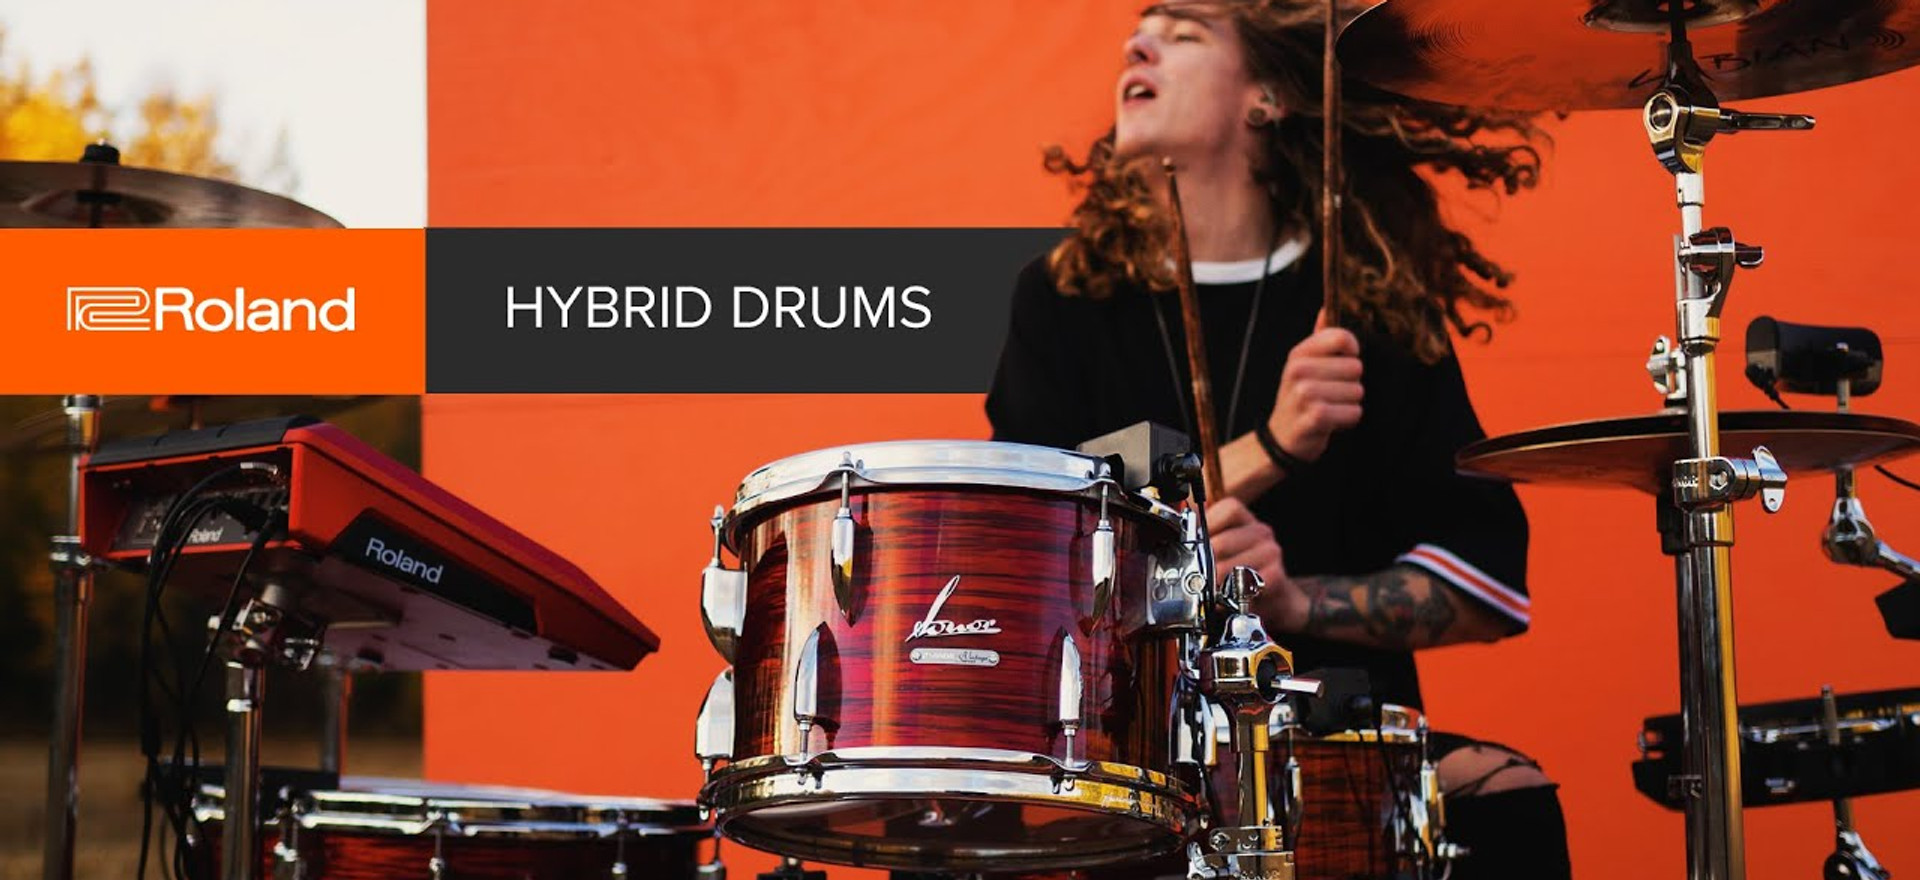 Roland Hybrid Drums: Your sound, no limits